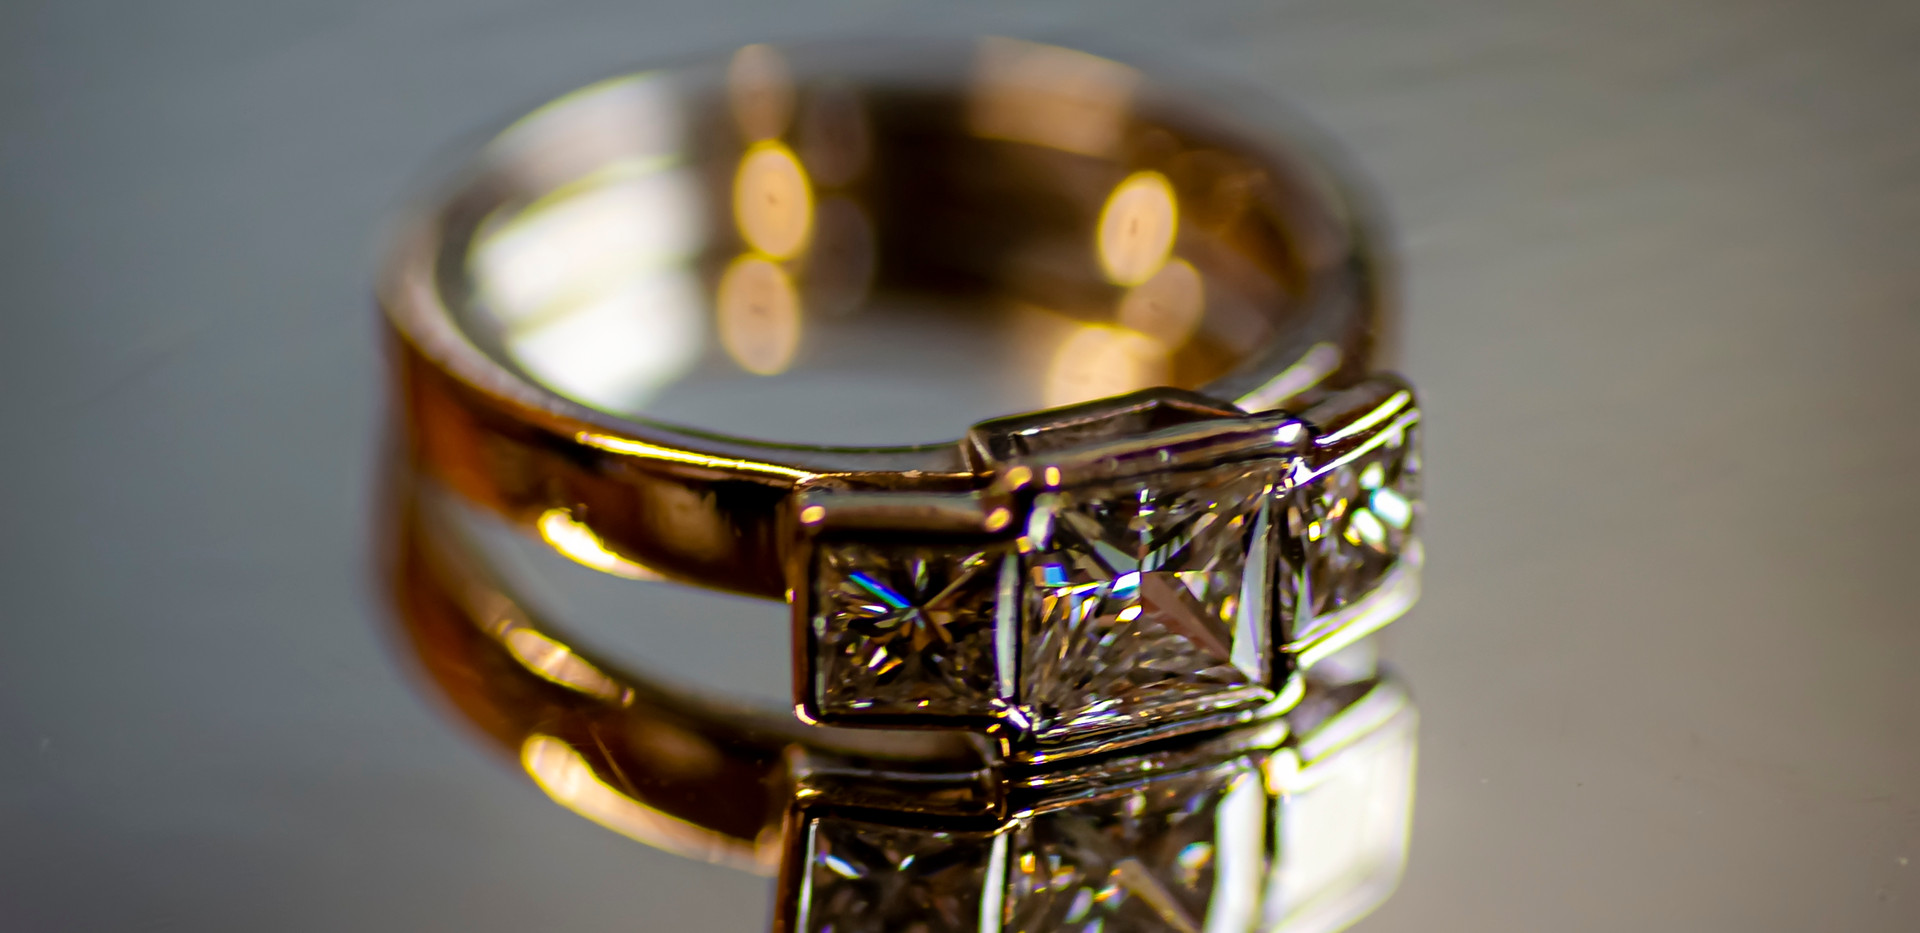 carron dymond ring.jpg